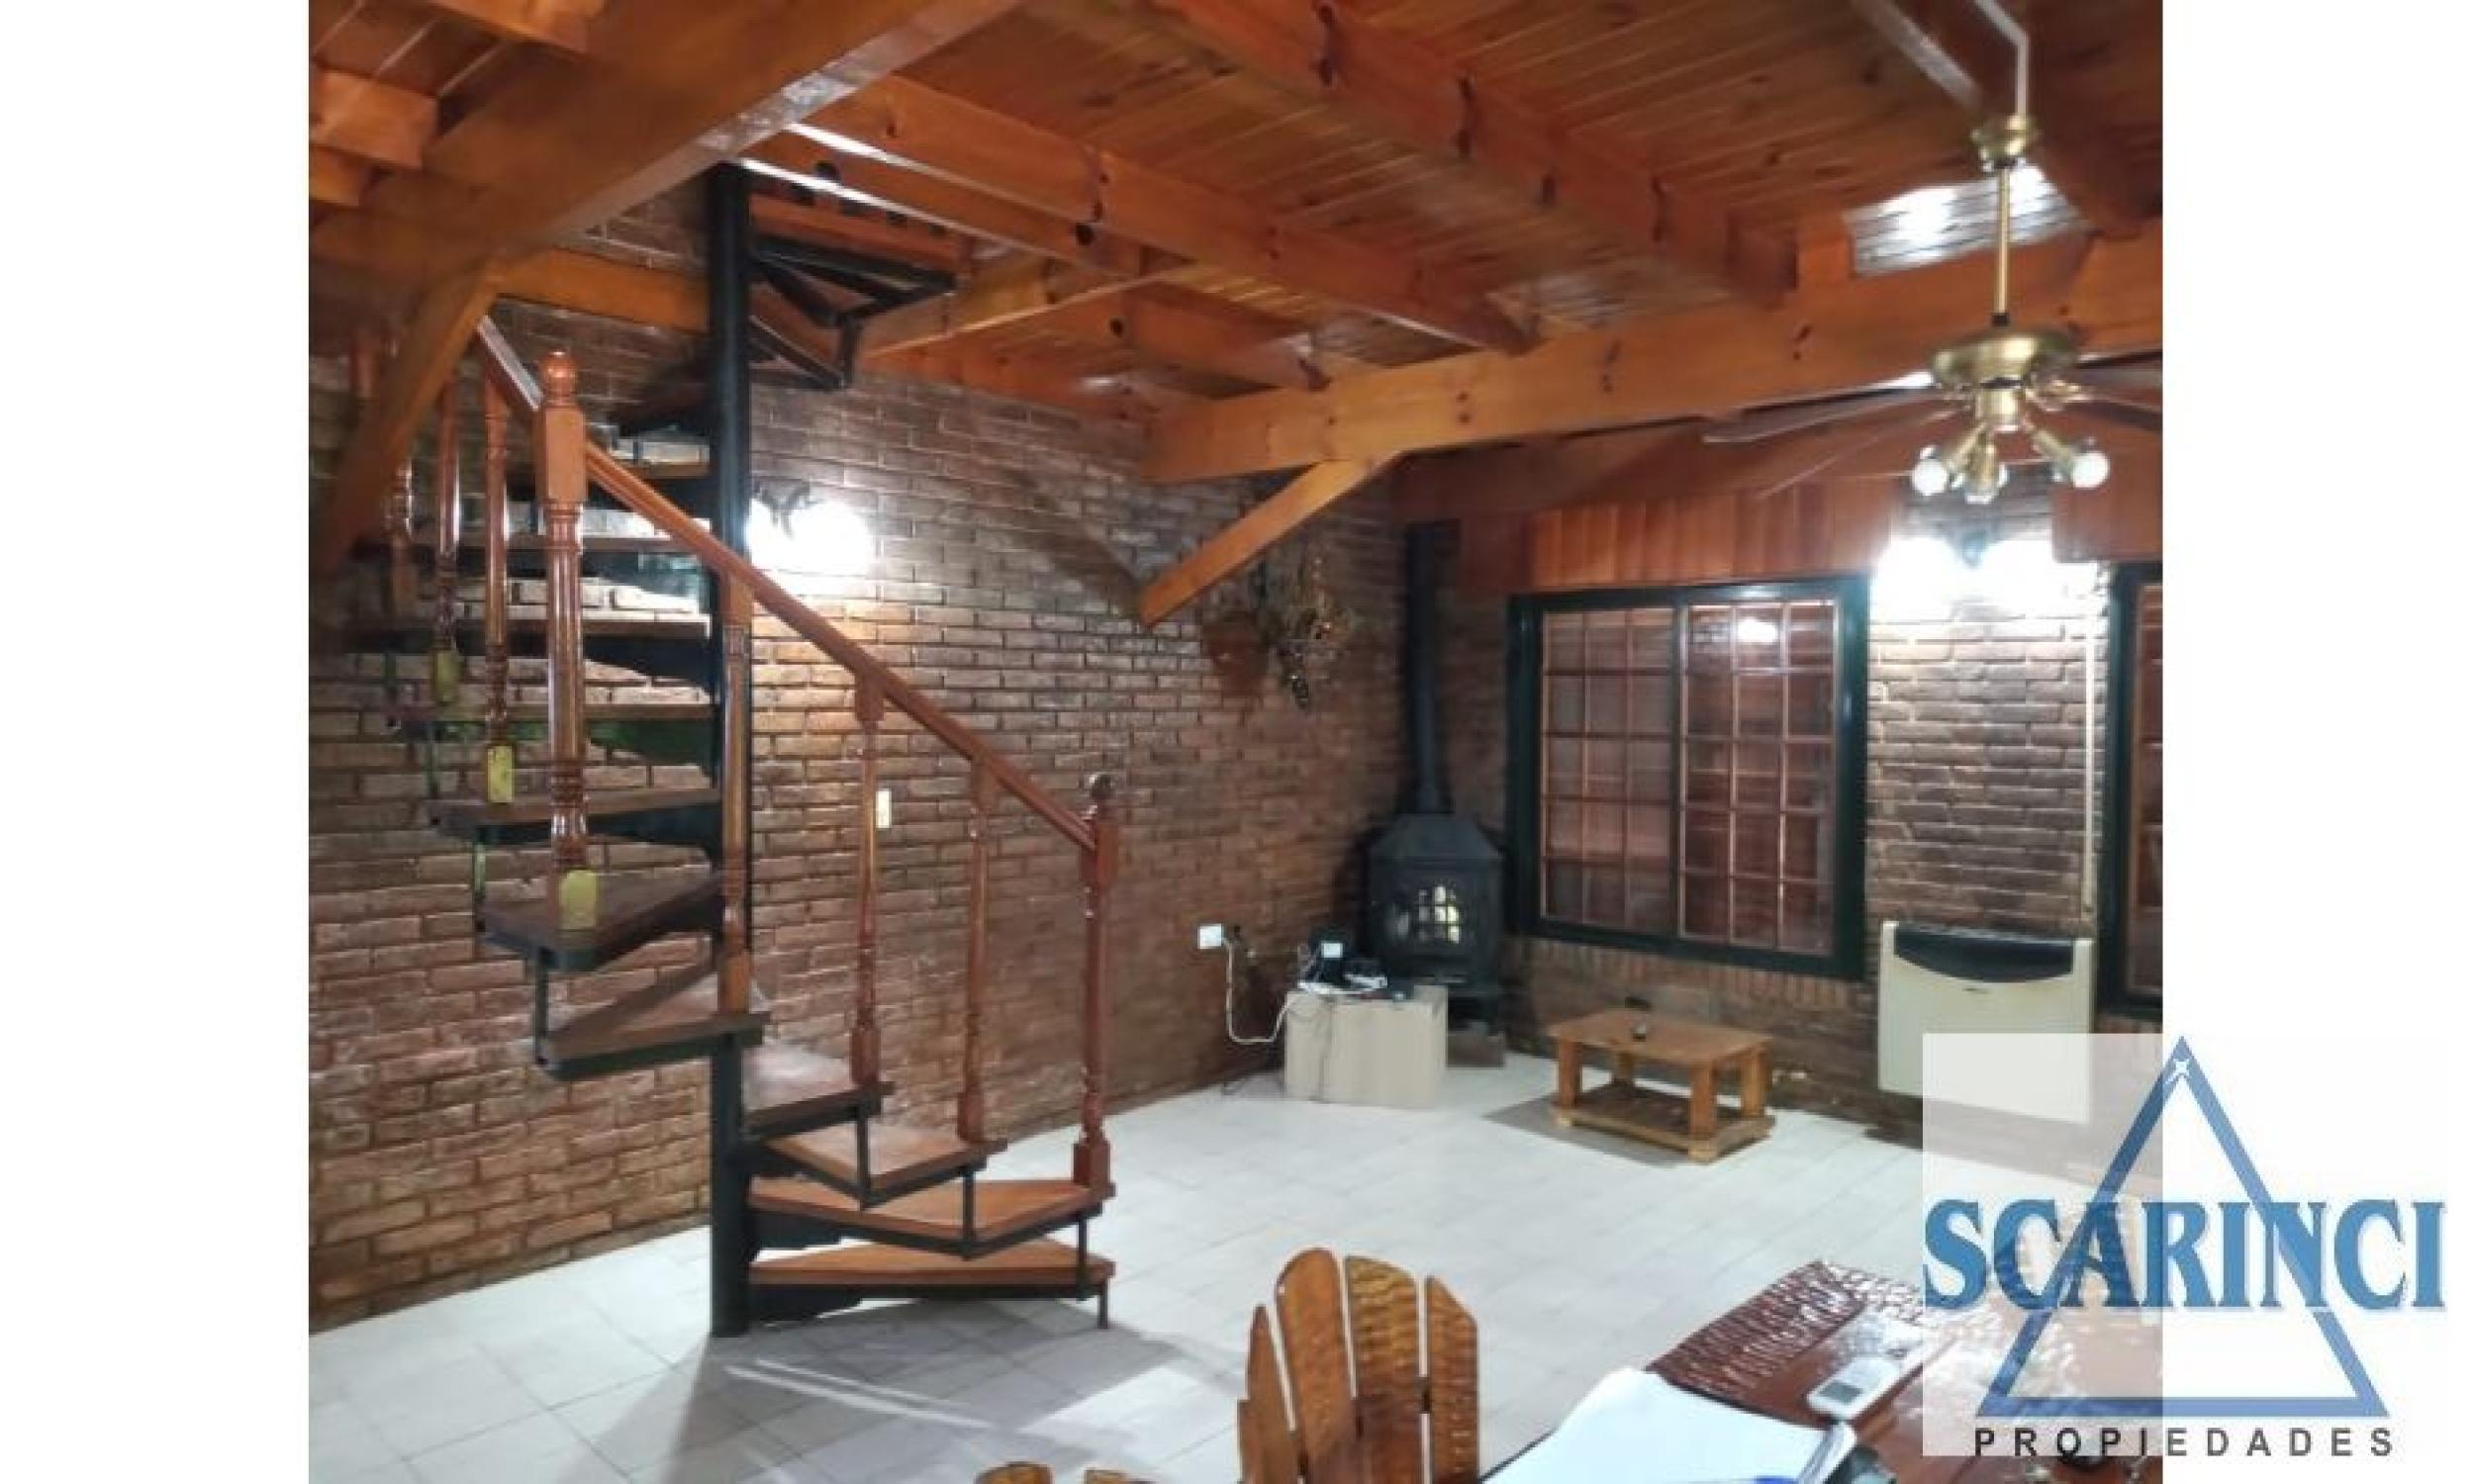 Del Malambo 2400, Parque Leloir - Ituzaingo, Buenos Aires, Argentina, 4 Habitaciones Habitaciones, 3 Habitaciones Habitaciones,3 BathroomsBathrooms,Quinta,Venta,Del Malambo ,1817